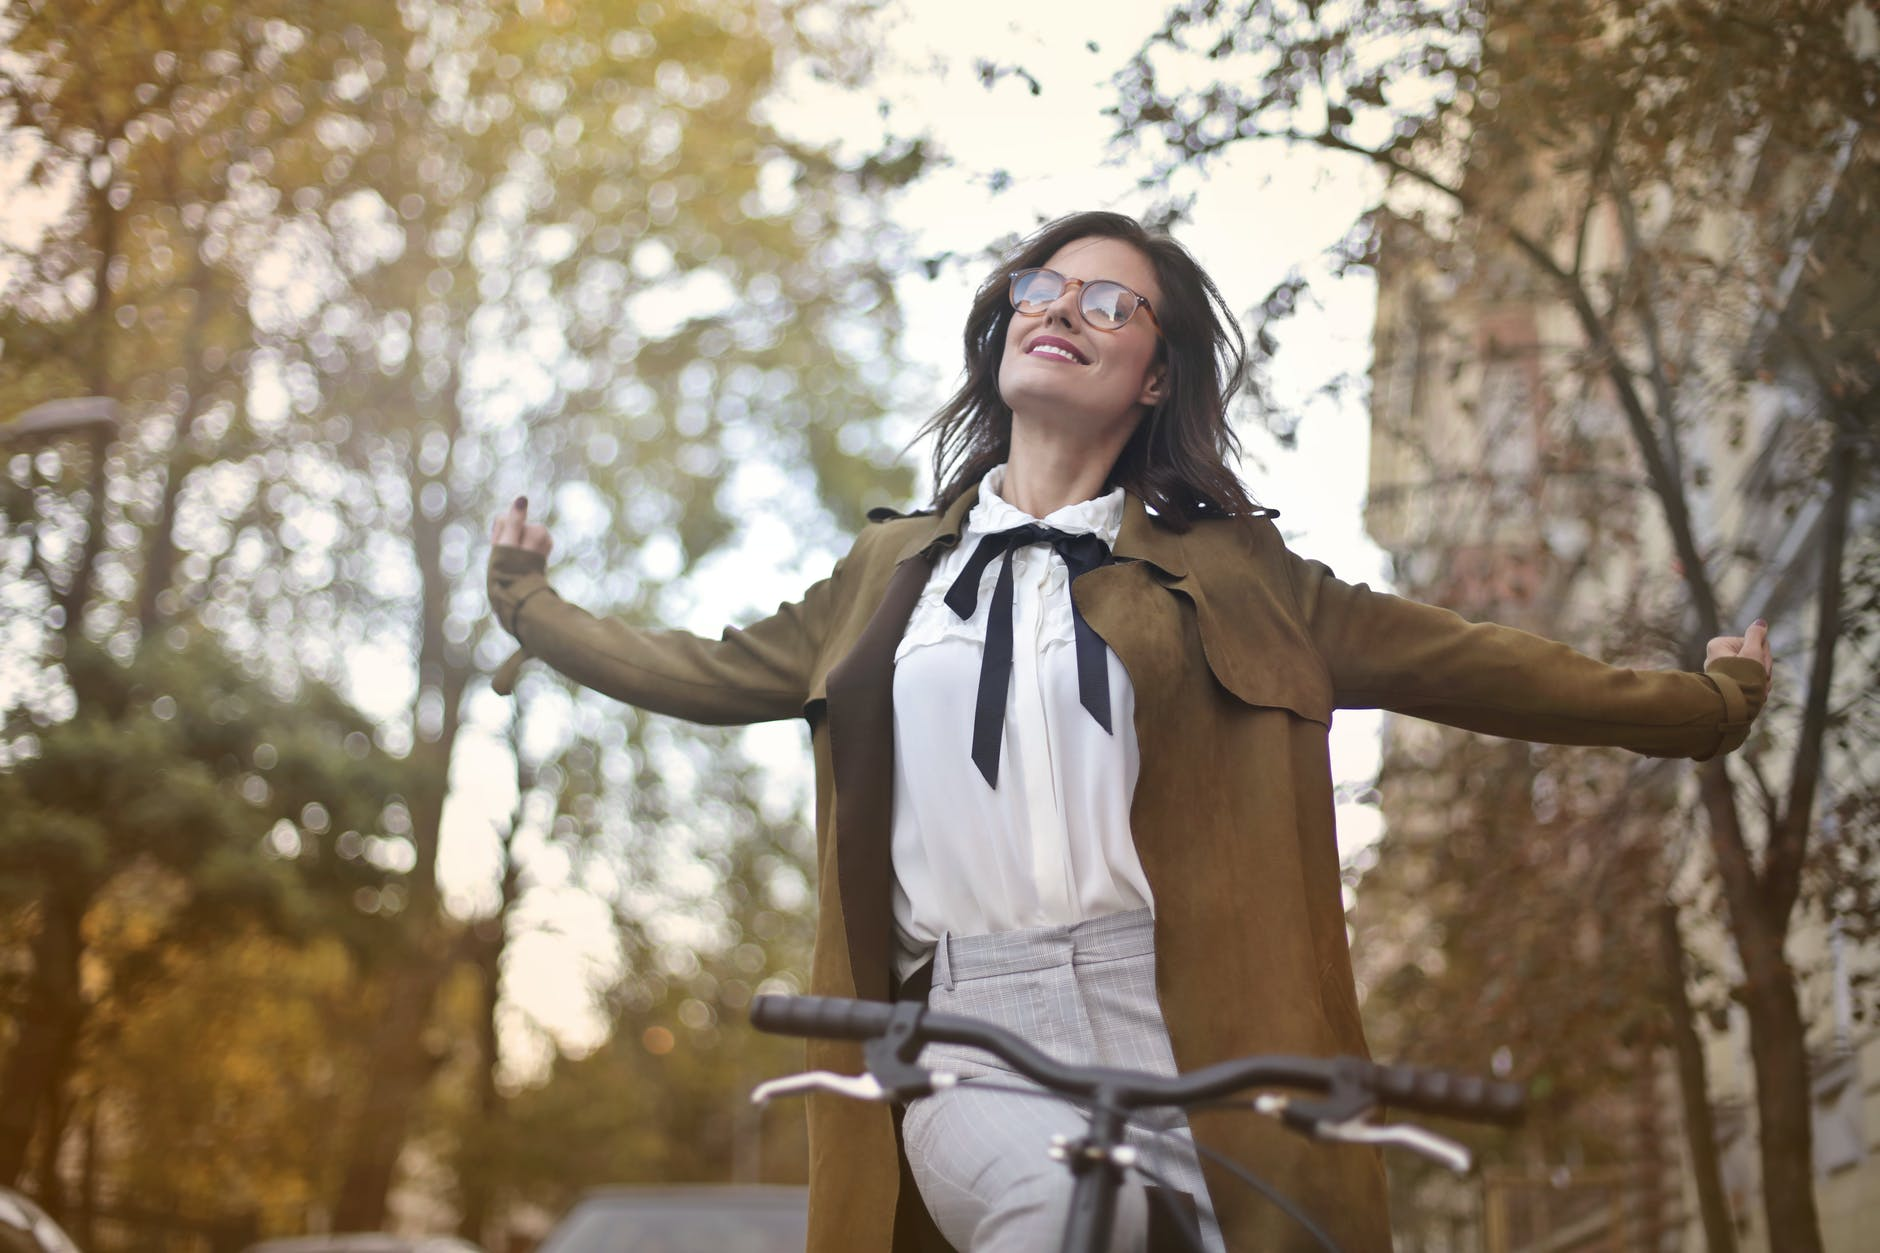 woman happy own a bike